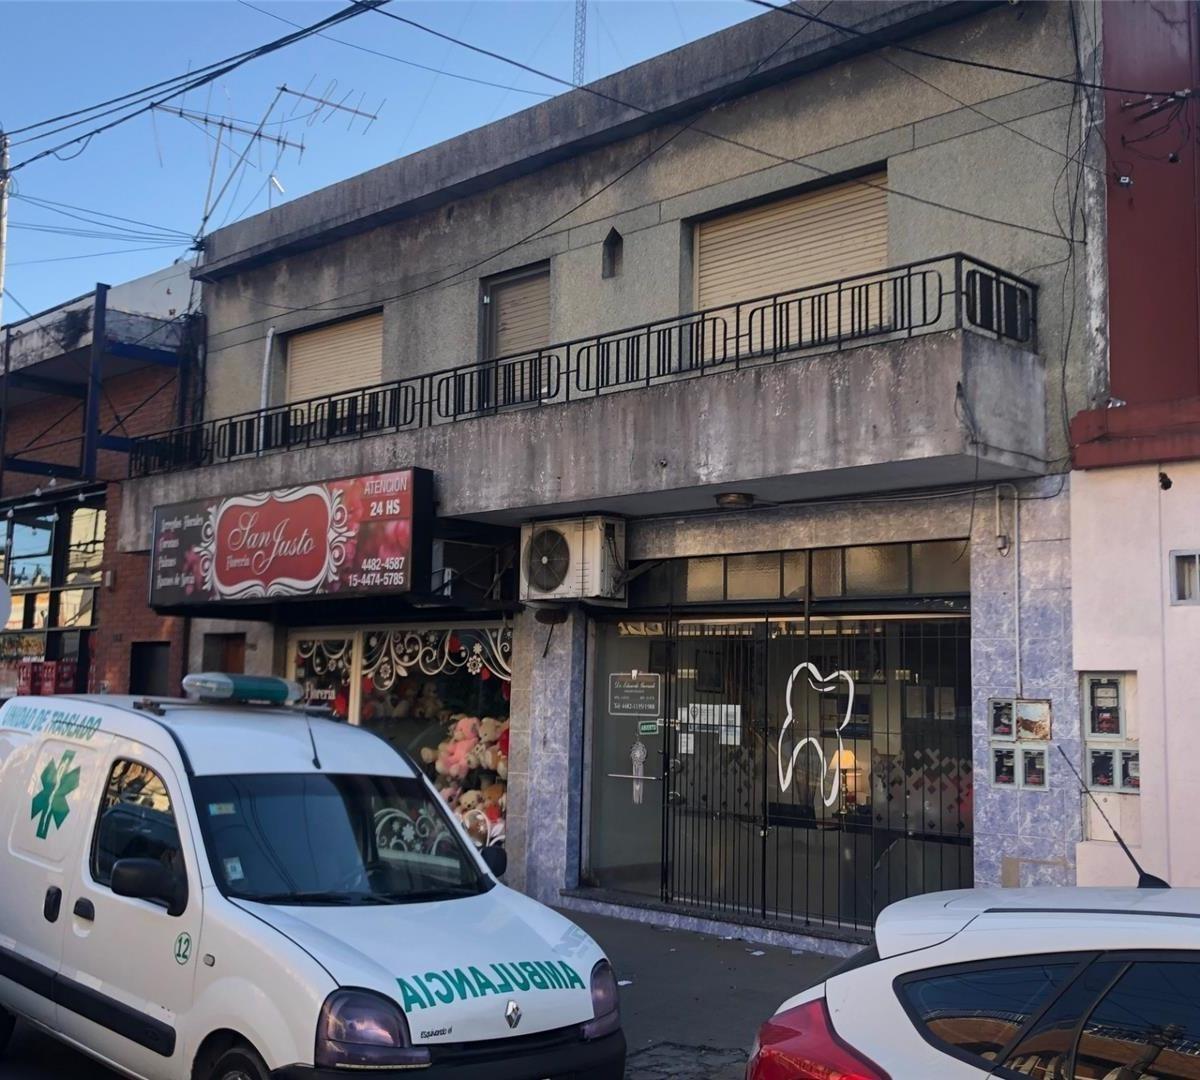 lote céntrico - 278 m2 totales - ideal emprendimiento inmobi